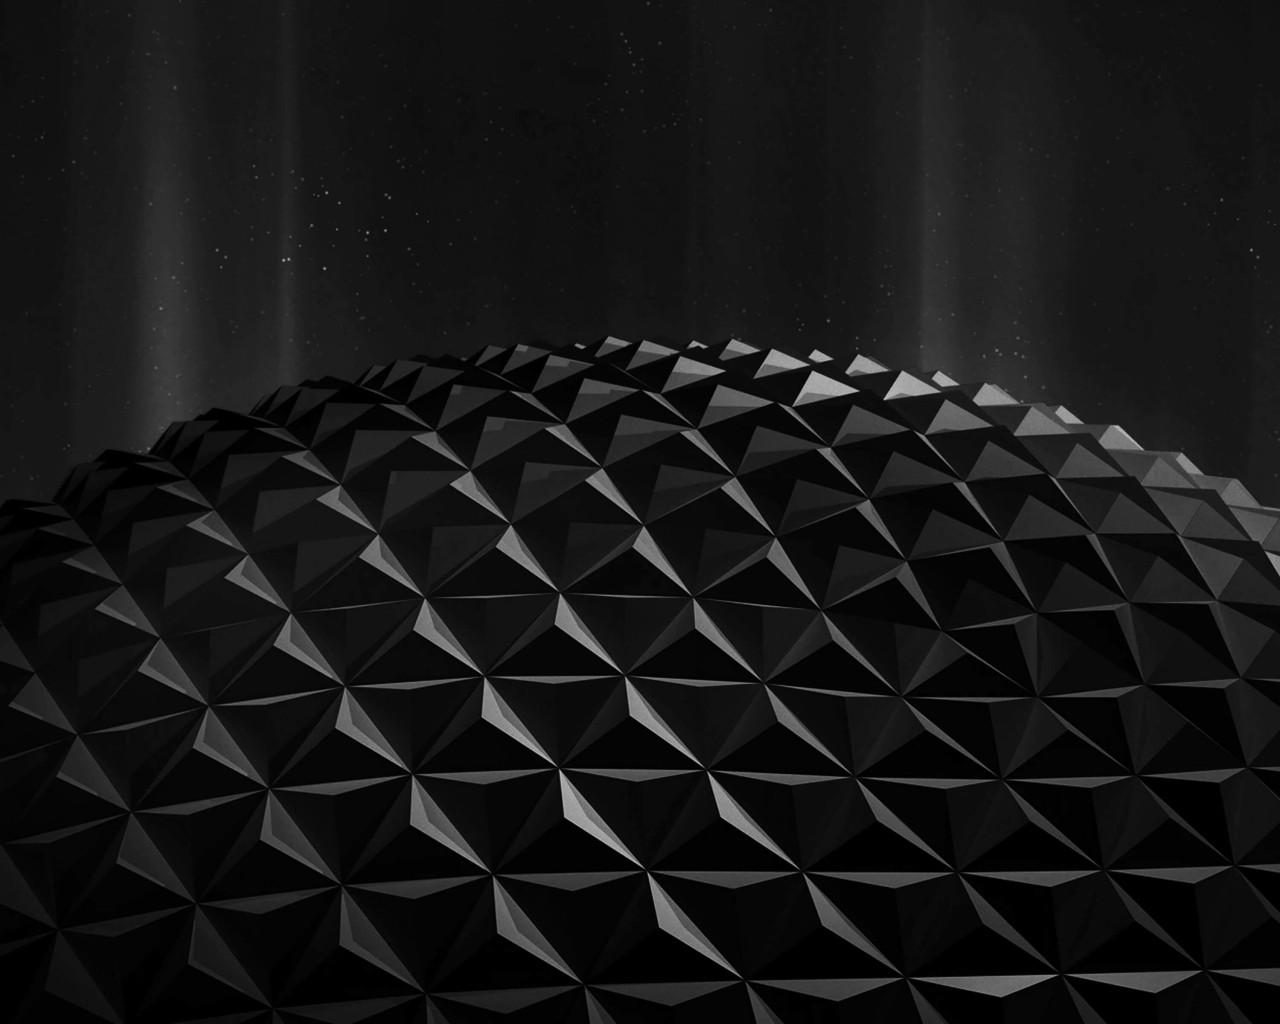 Download Black Polygon Planet HD Wallpaper For 1280 X 1024